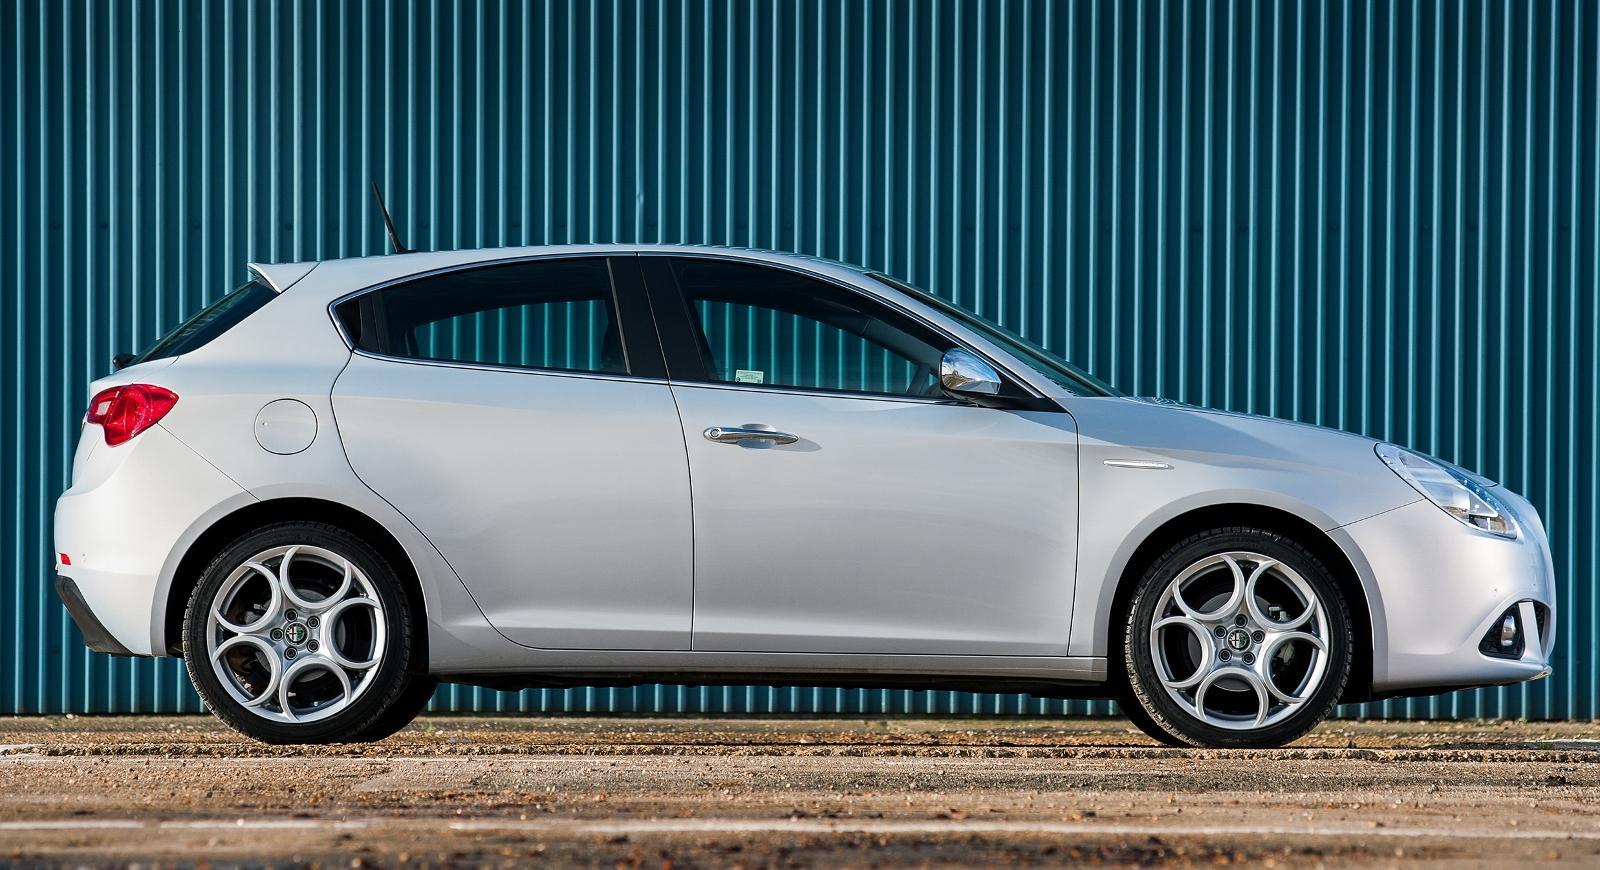 Choose the best company car